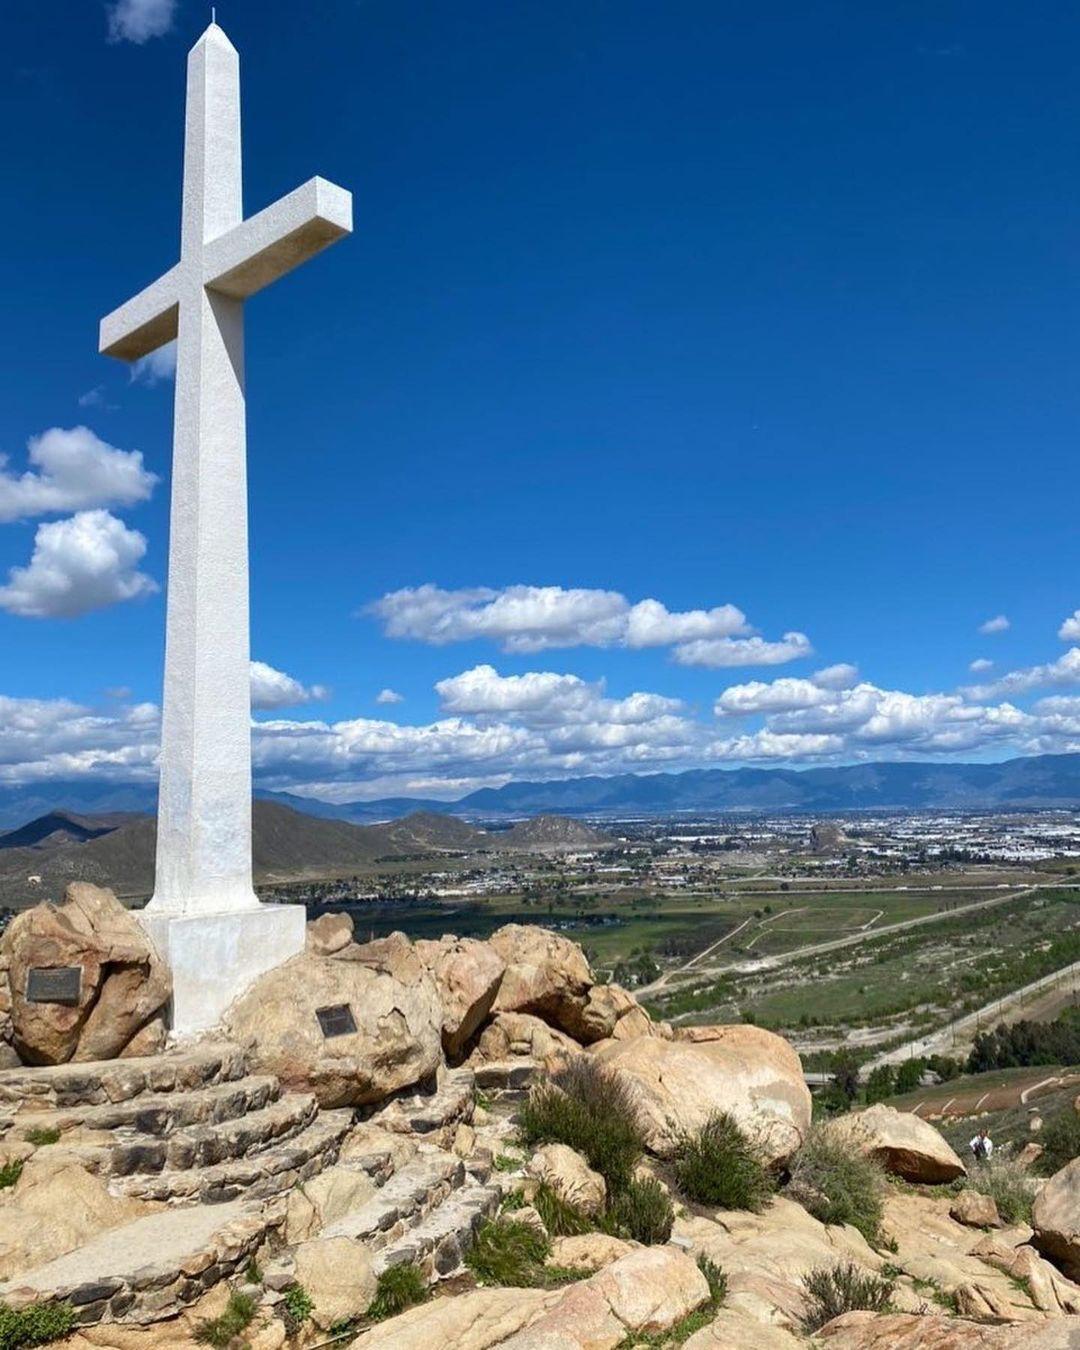 Riverside在天空下的十字架✝️ 图1